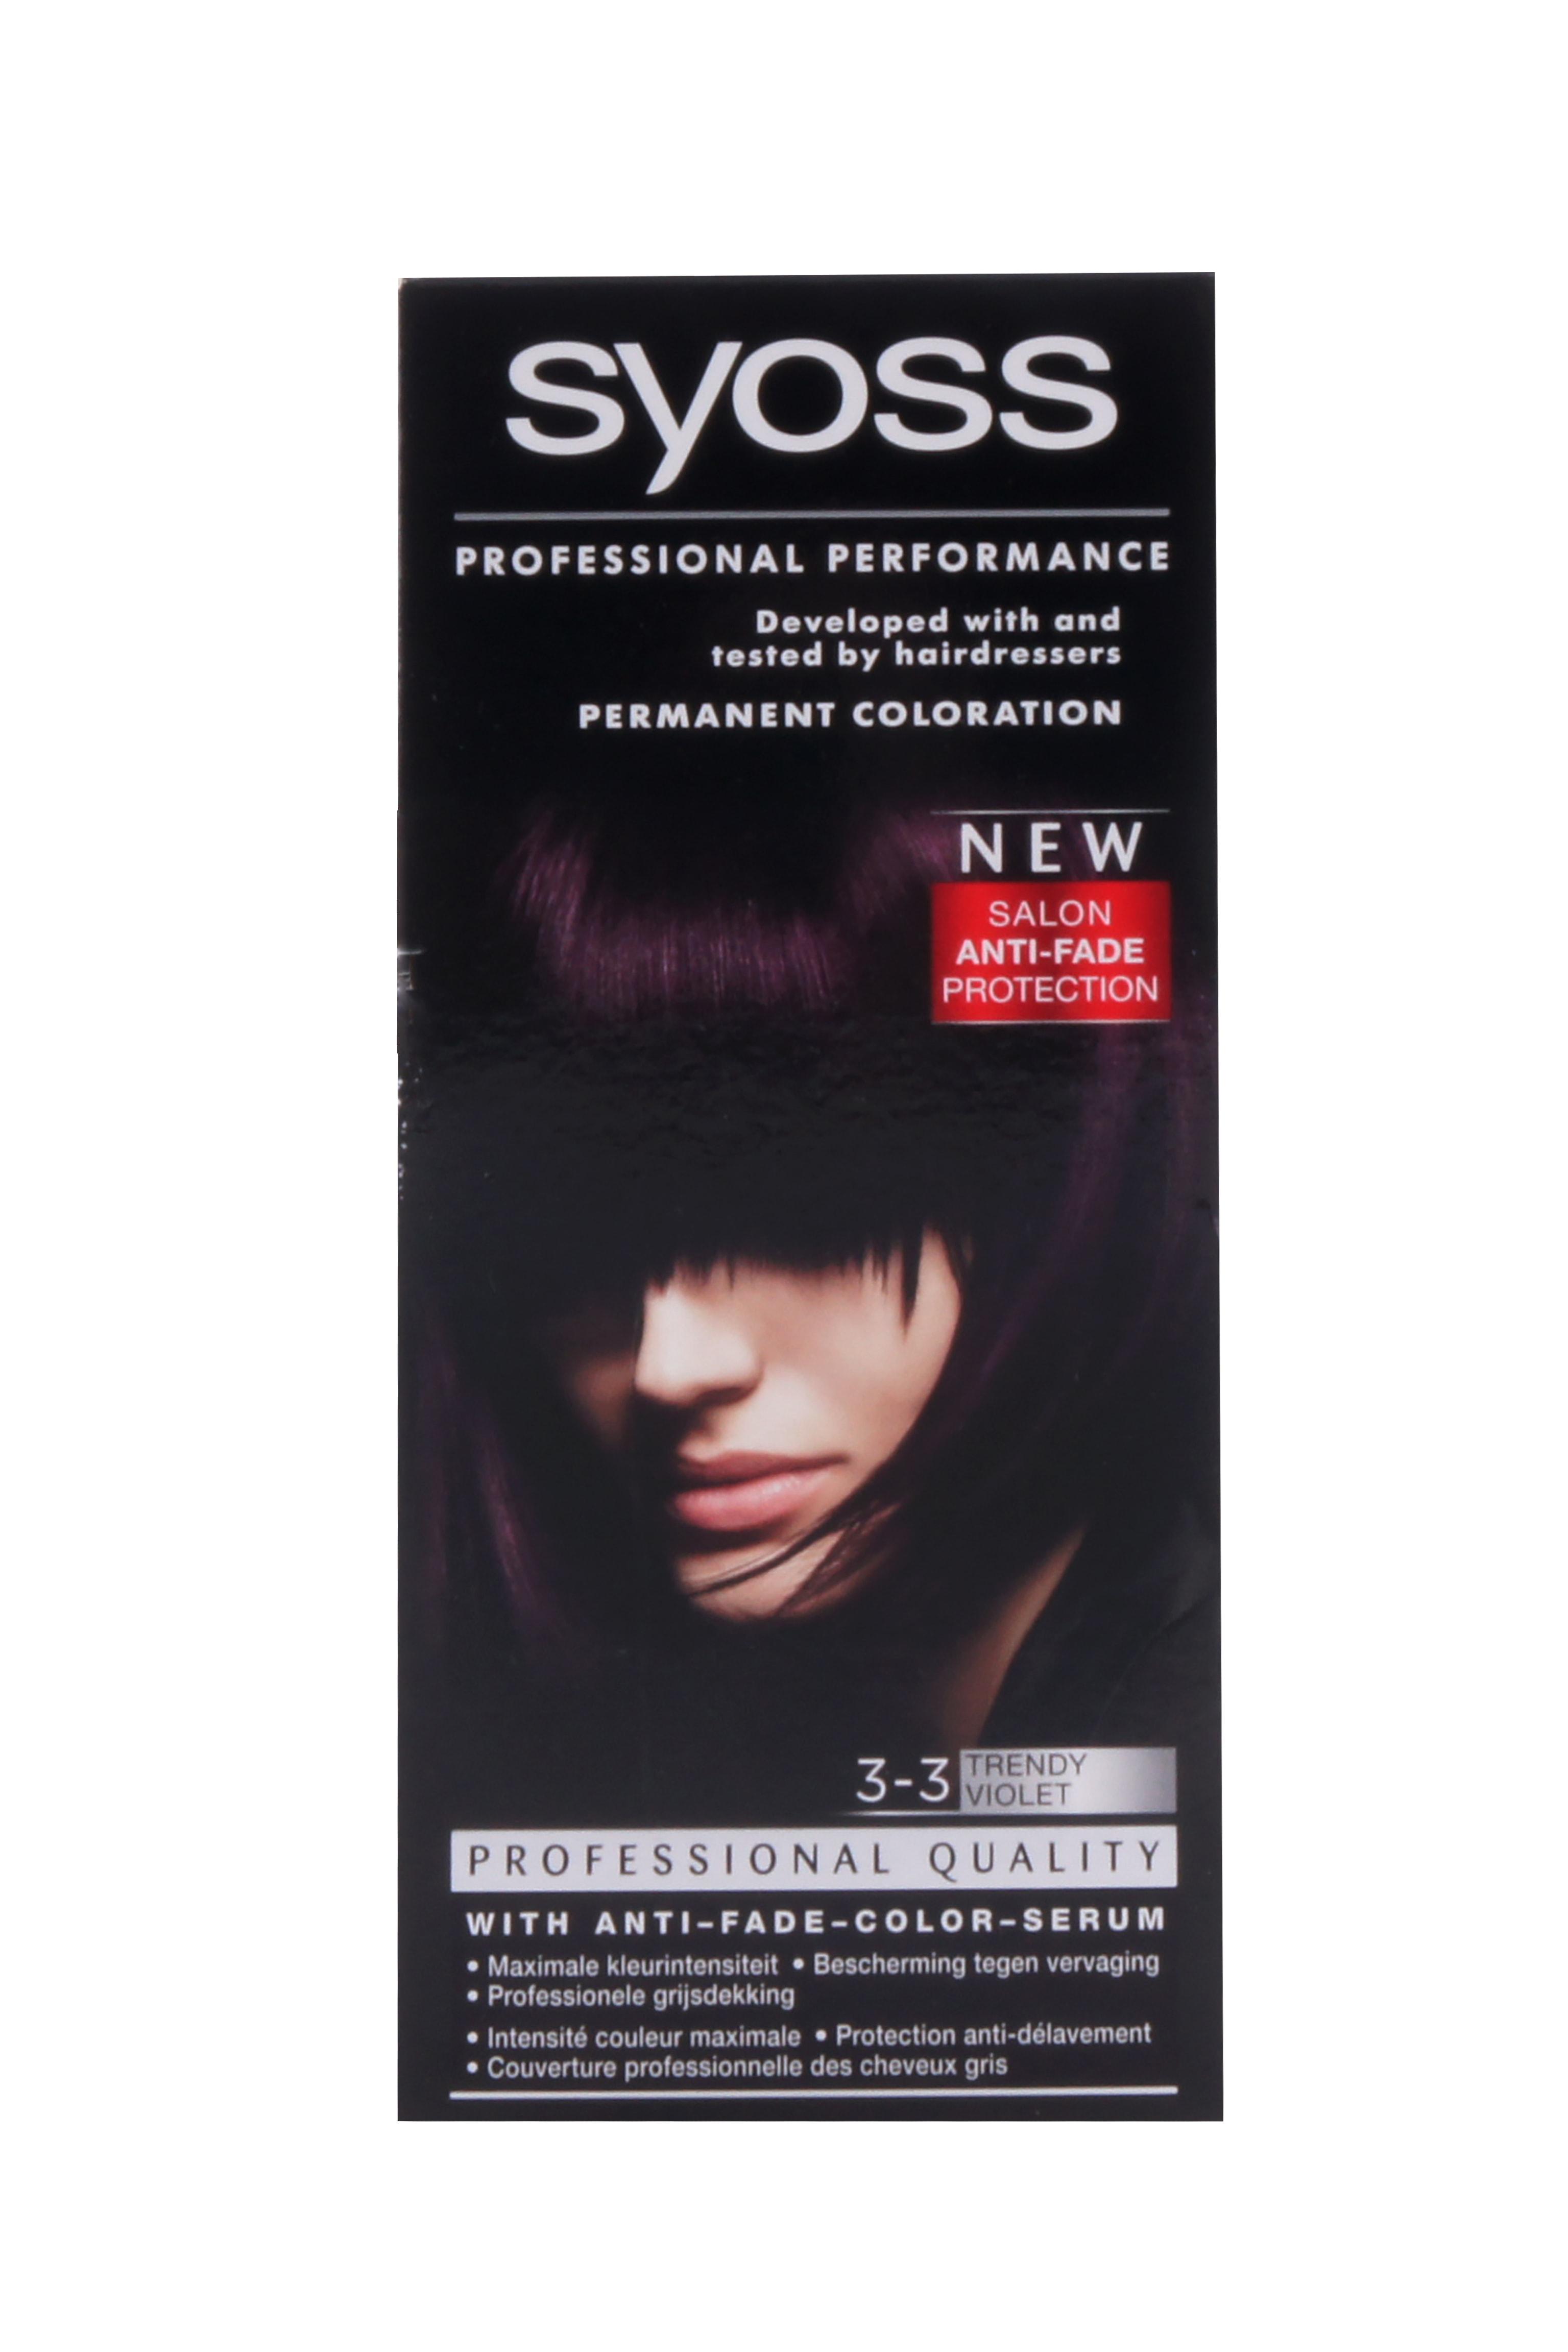 Syoss Haarverf 33 Trendy Violet  Stuntpakkernl